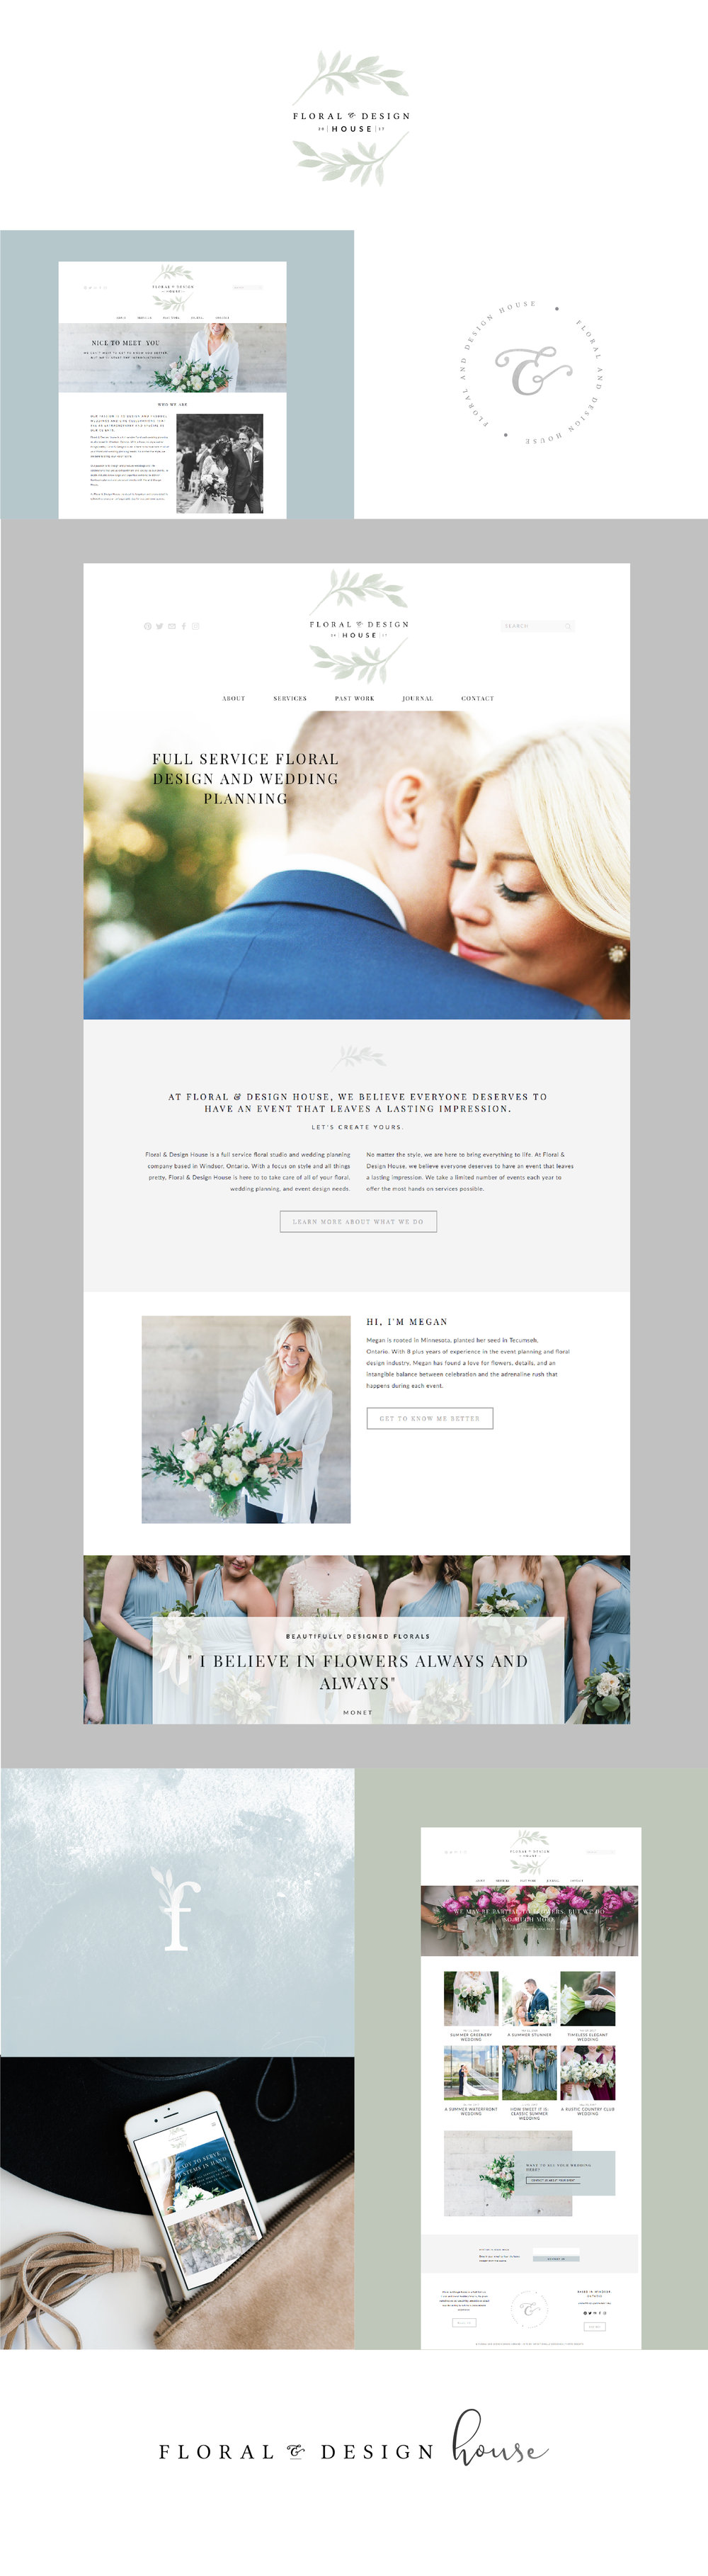 Brand + Website Design + Development